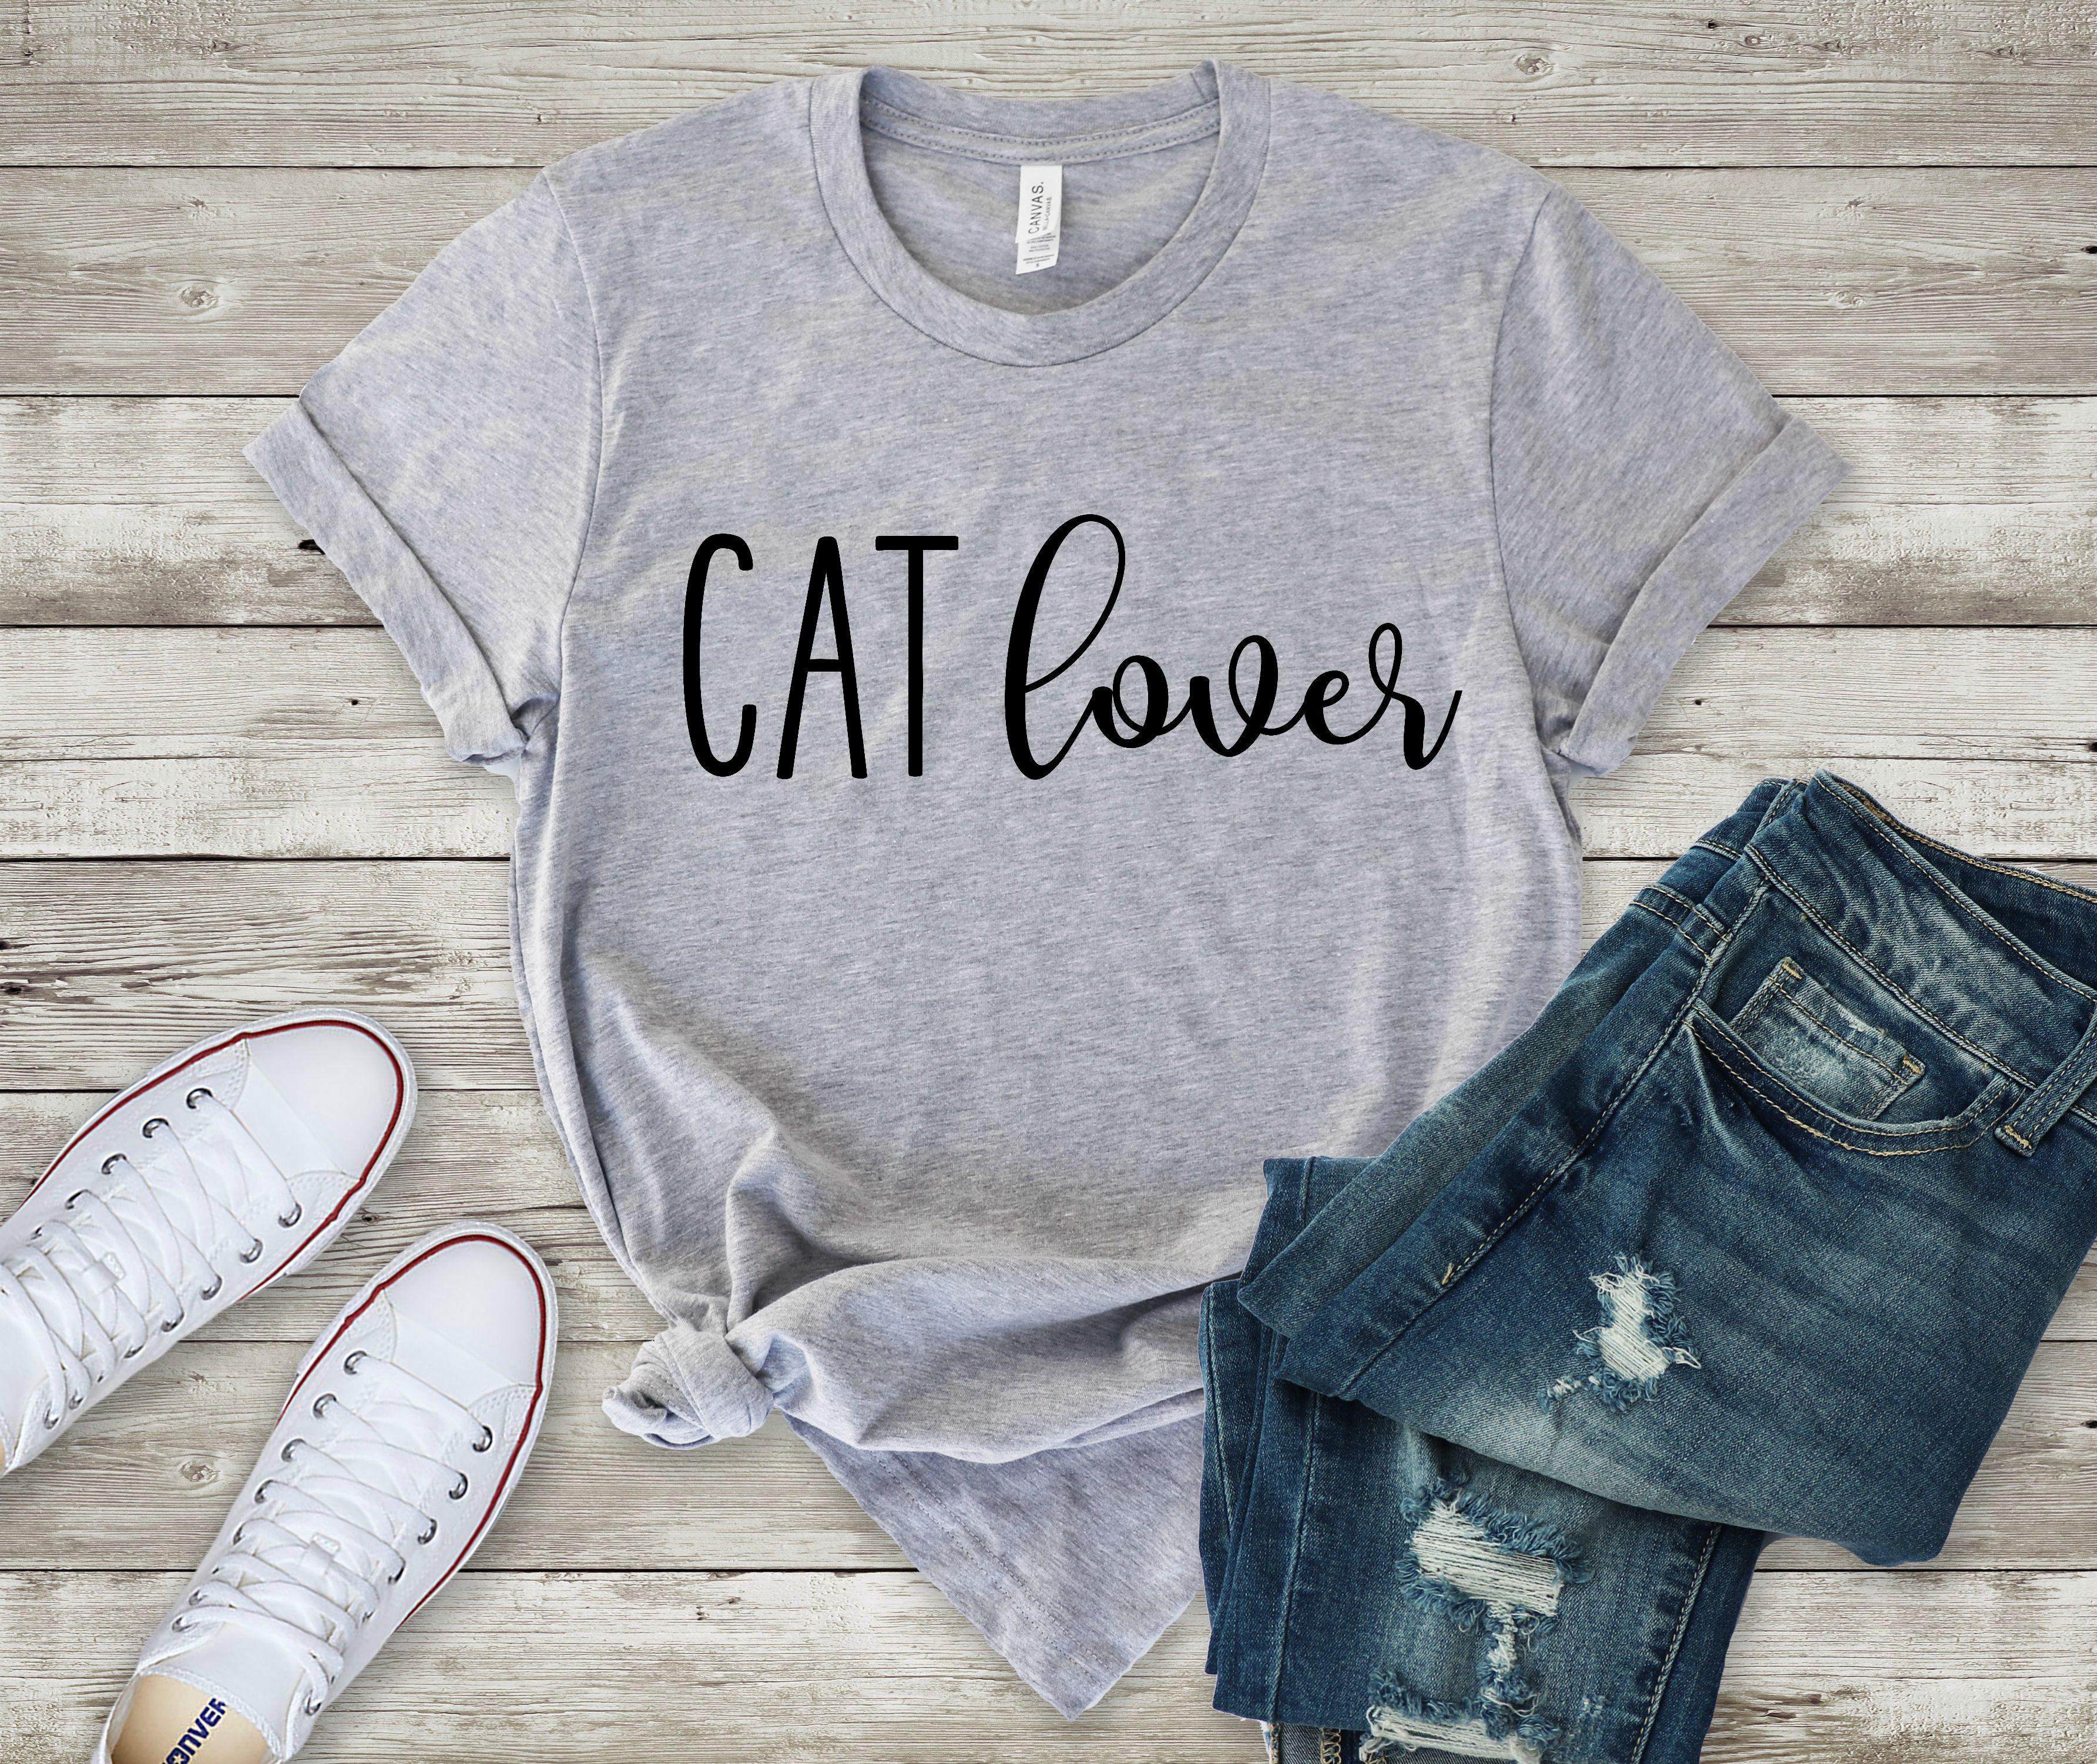 Cat Lover Digital Cut File, SVG, PNG, JPG